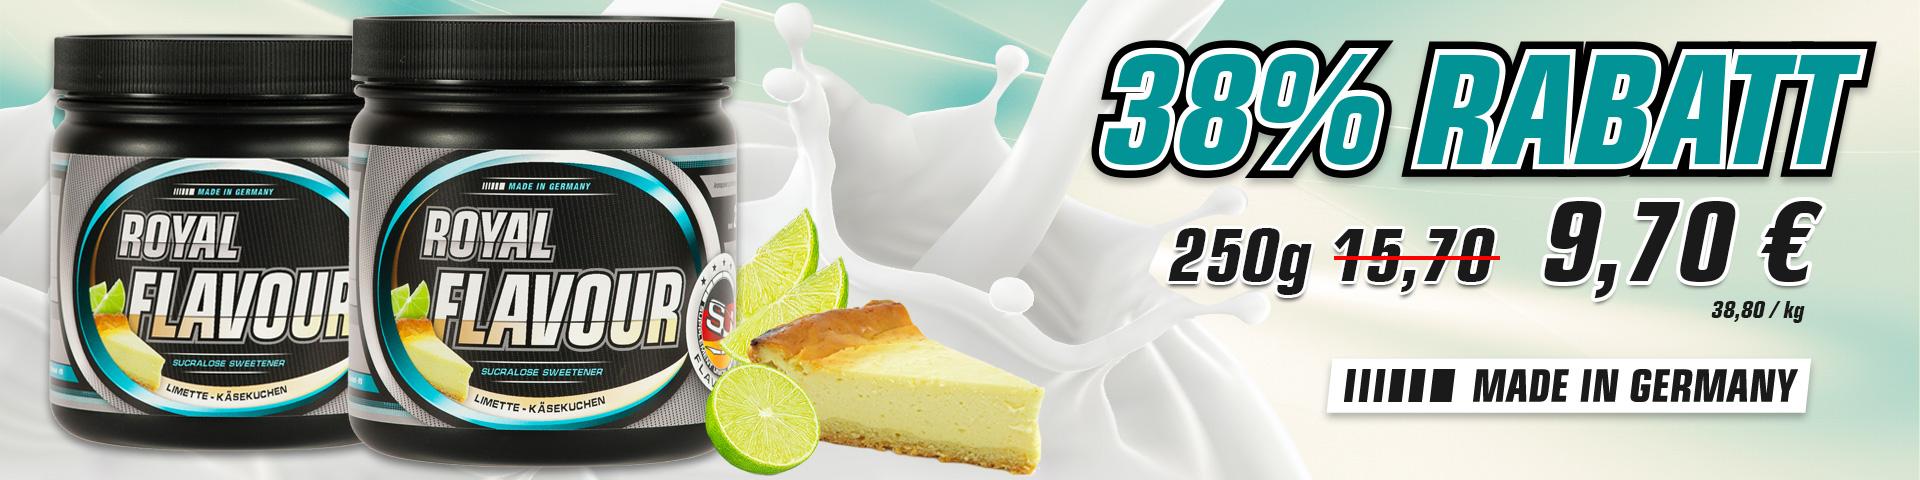 royal-flavour-limette-kaesekuchen.jpg